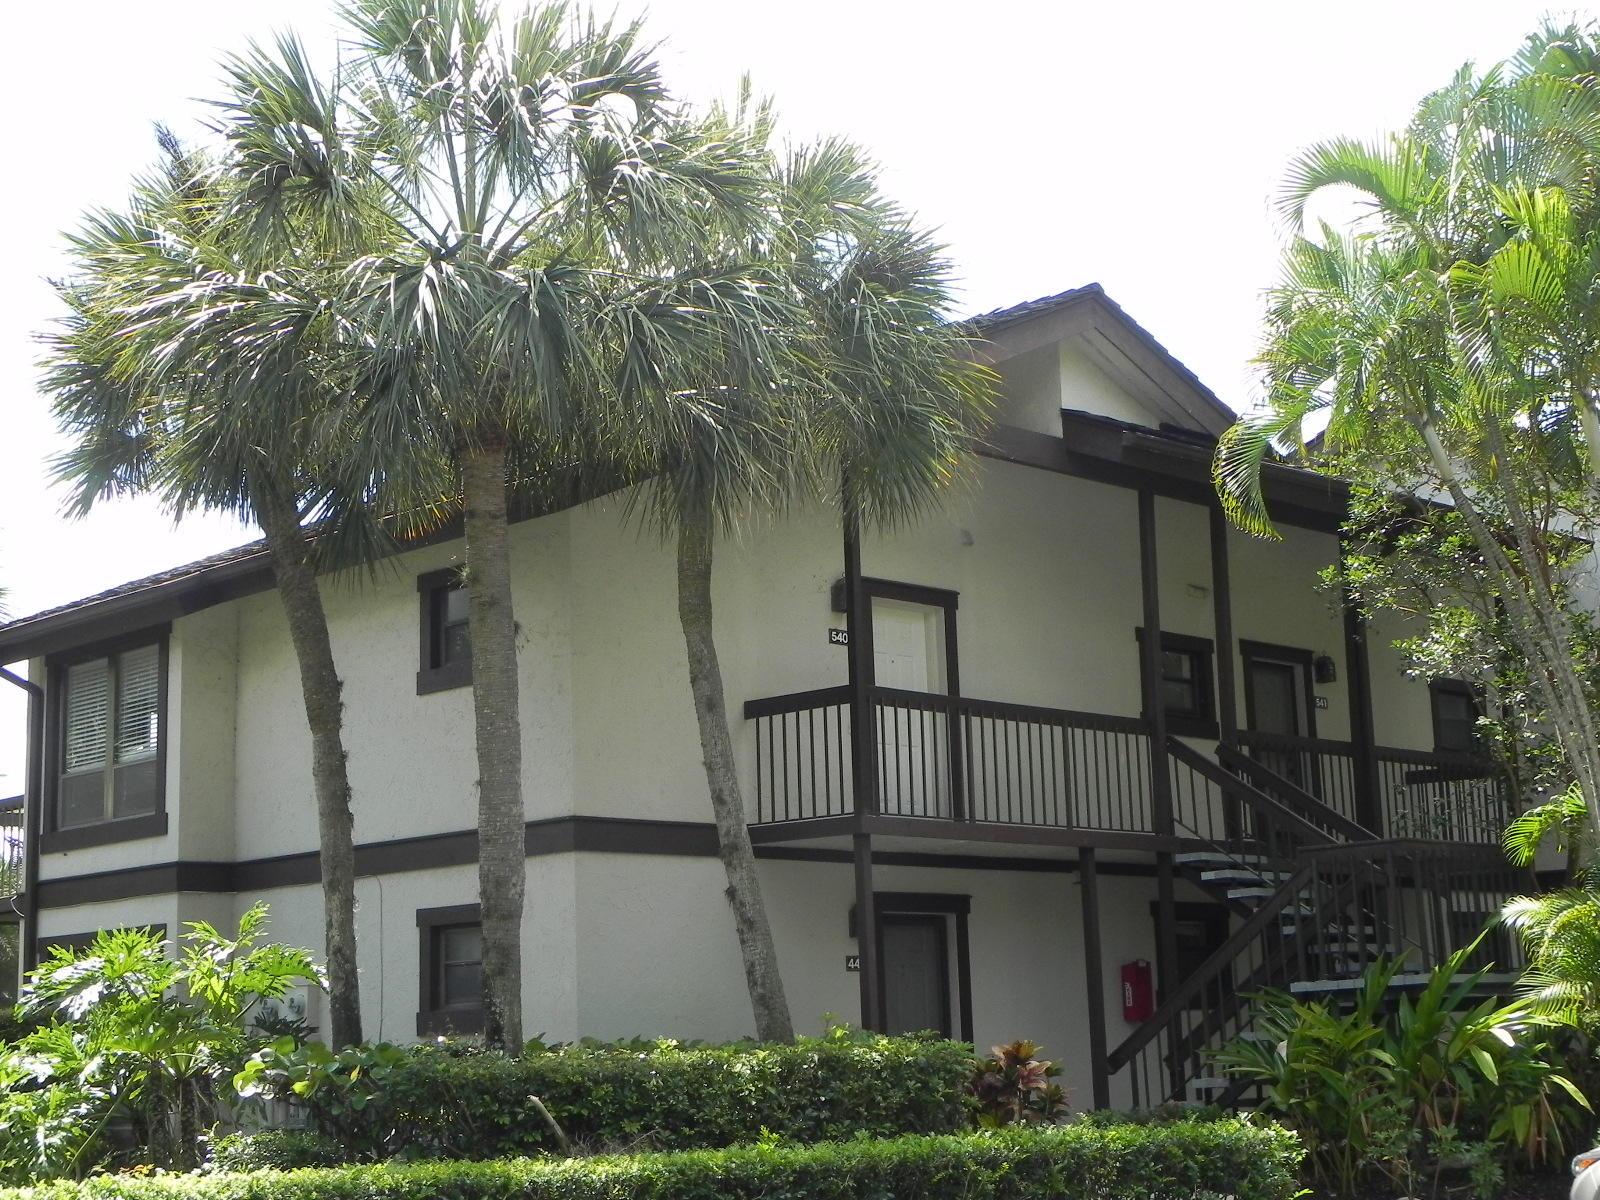 11863 Wimbledon Circle, Wellington, Florida 33414, 2 Bedrooms Bedrooms, ,2 BathroomsBathrooms,Condo/Coop,For Sale,Wimbledon,2,RX-10545792